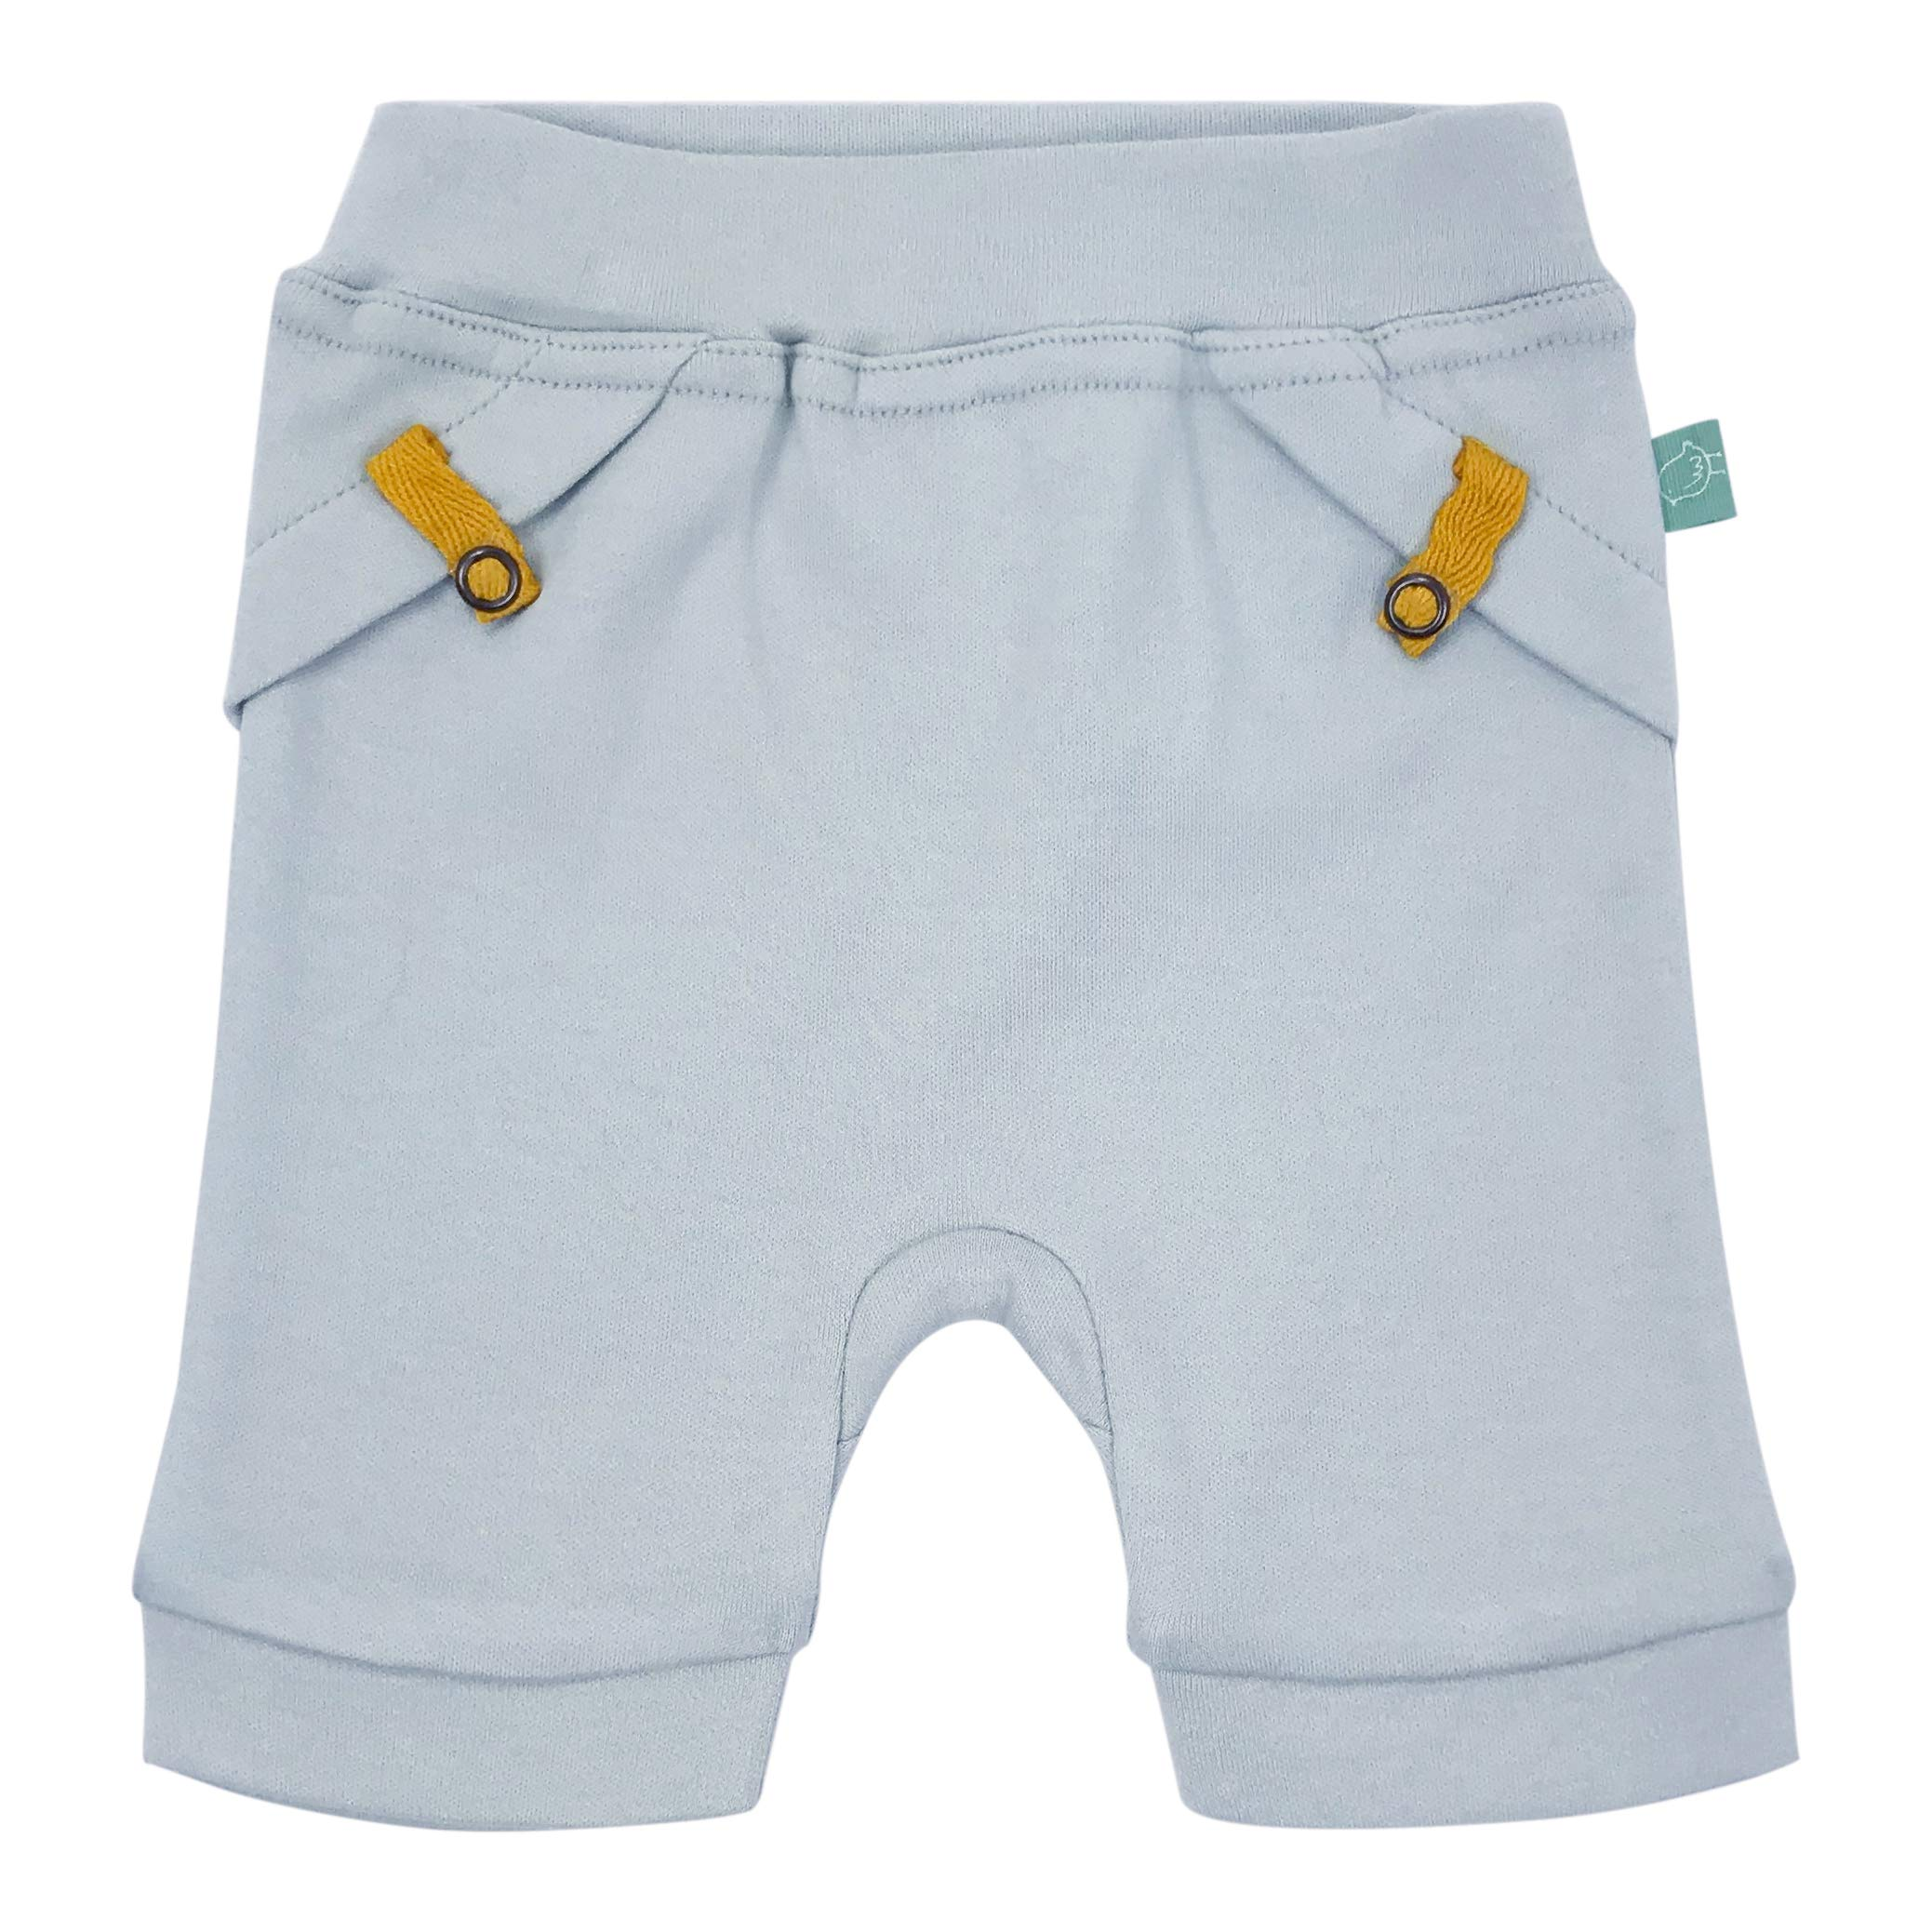 Finn + Emma Organic Cotton Pull-up Baby Shorts – Ice Flow Blue, 9-12 Months